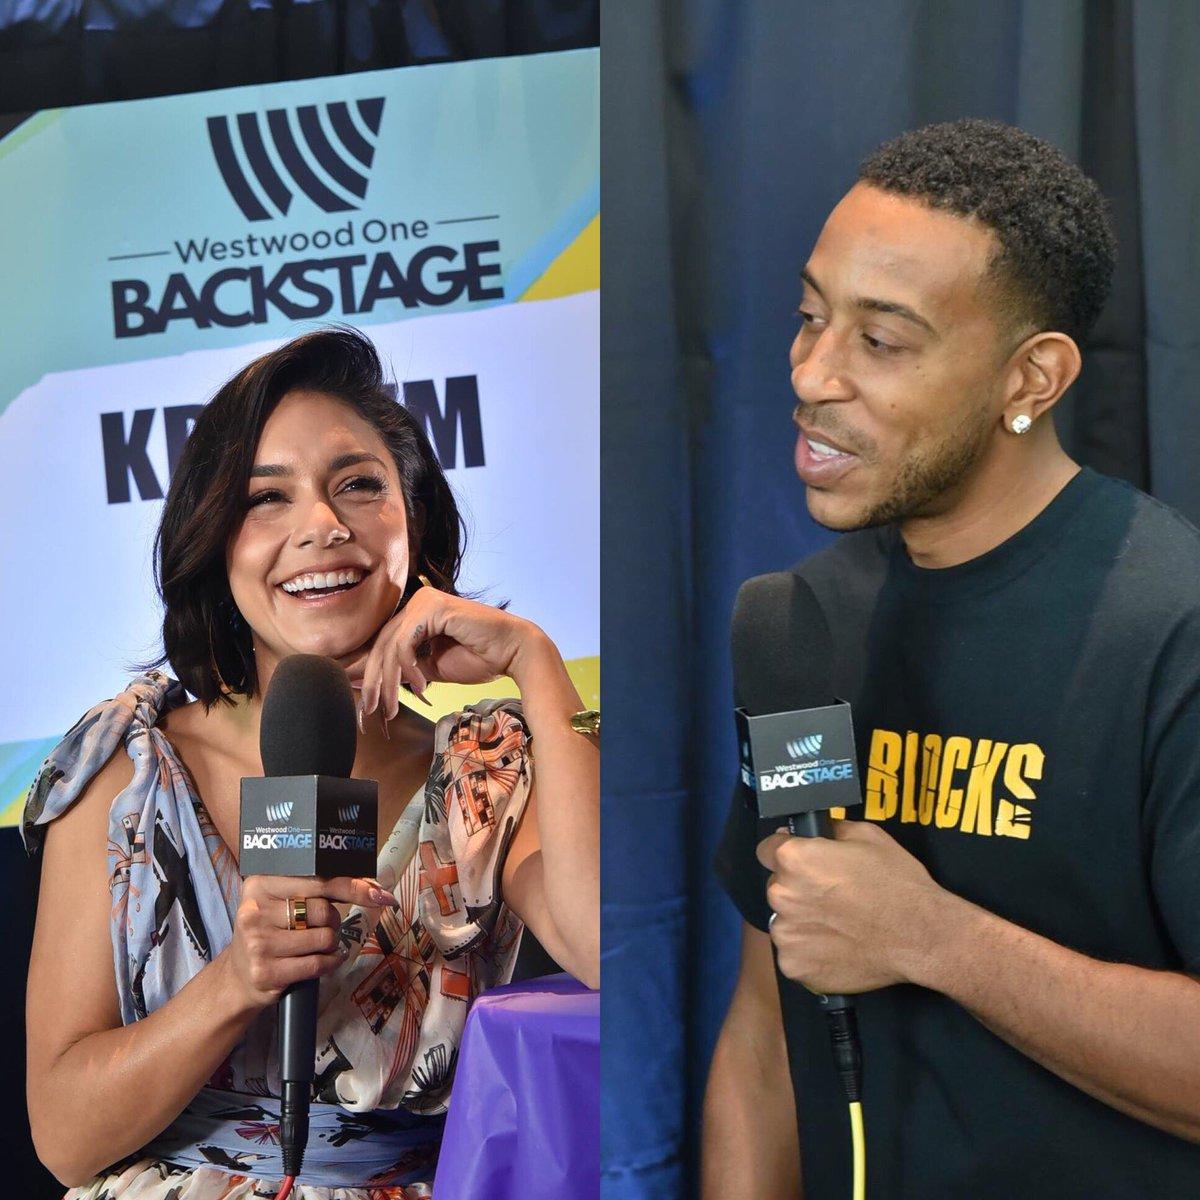 Before the @bbmas, #BBMAs  hosts @Ludacris @VanessaHudgens stopped by the #WWOBackstage! #Ludacris #VanessaHudgens #VitaminD #RemindingMe  <br>http://pic.twitter.com/YmDFbTYbFB